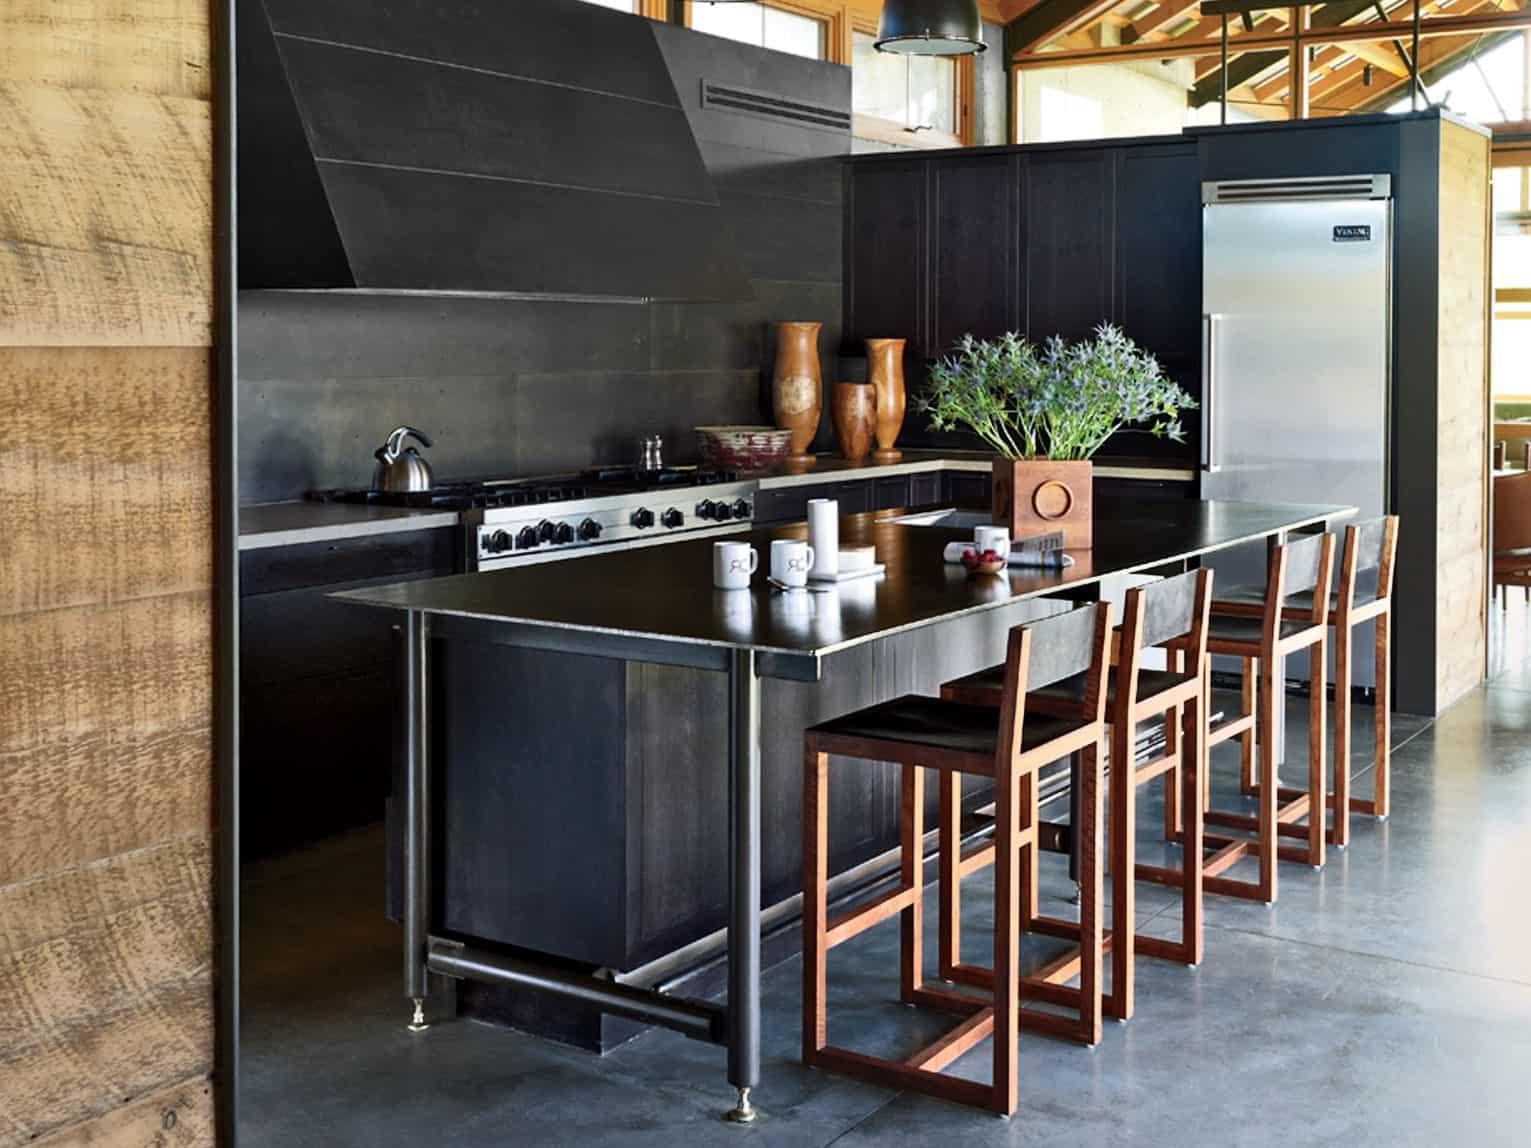 metalic stools